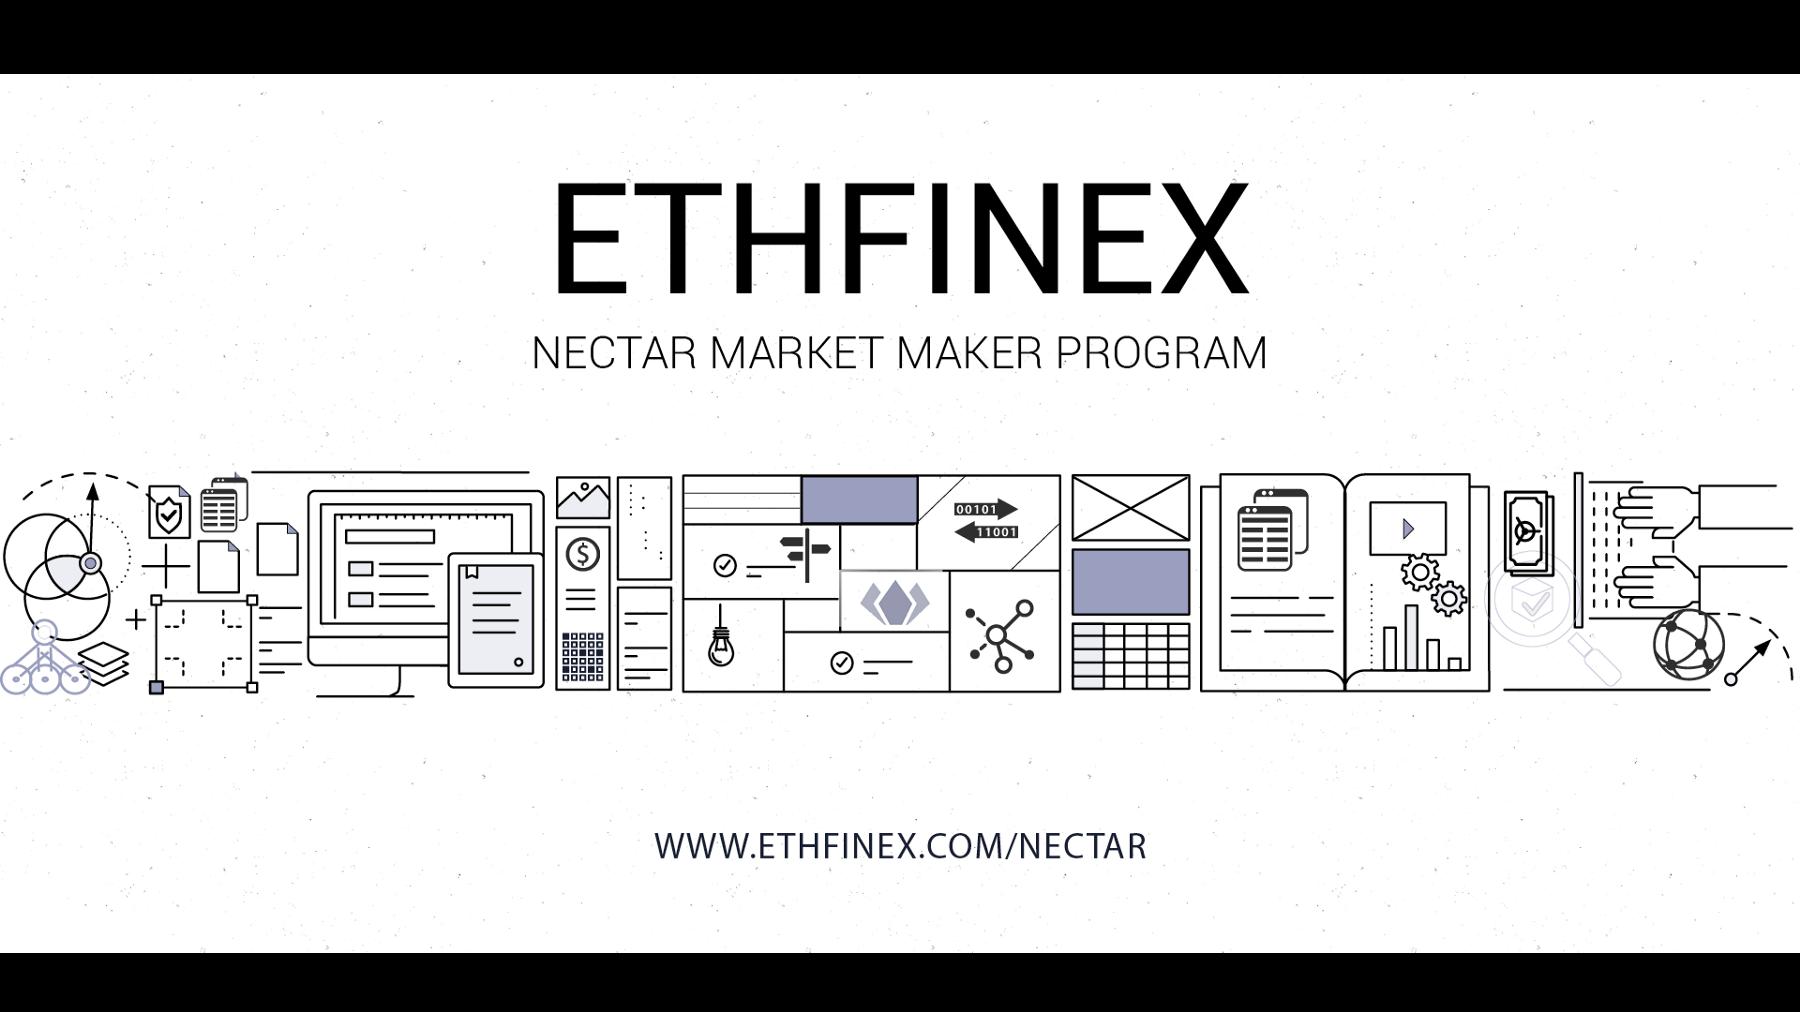 Ethfinex啟動nectar.community,創立去中央法交易所